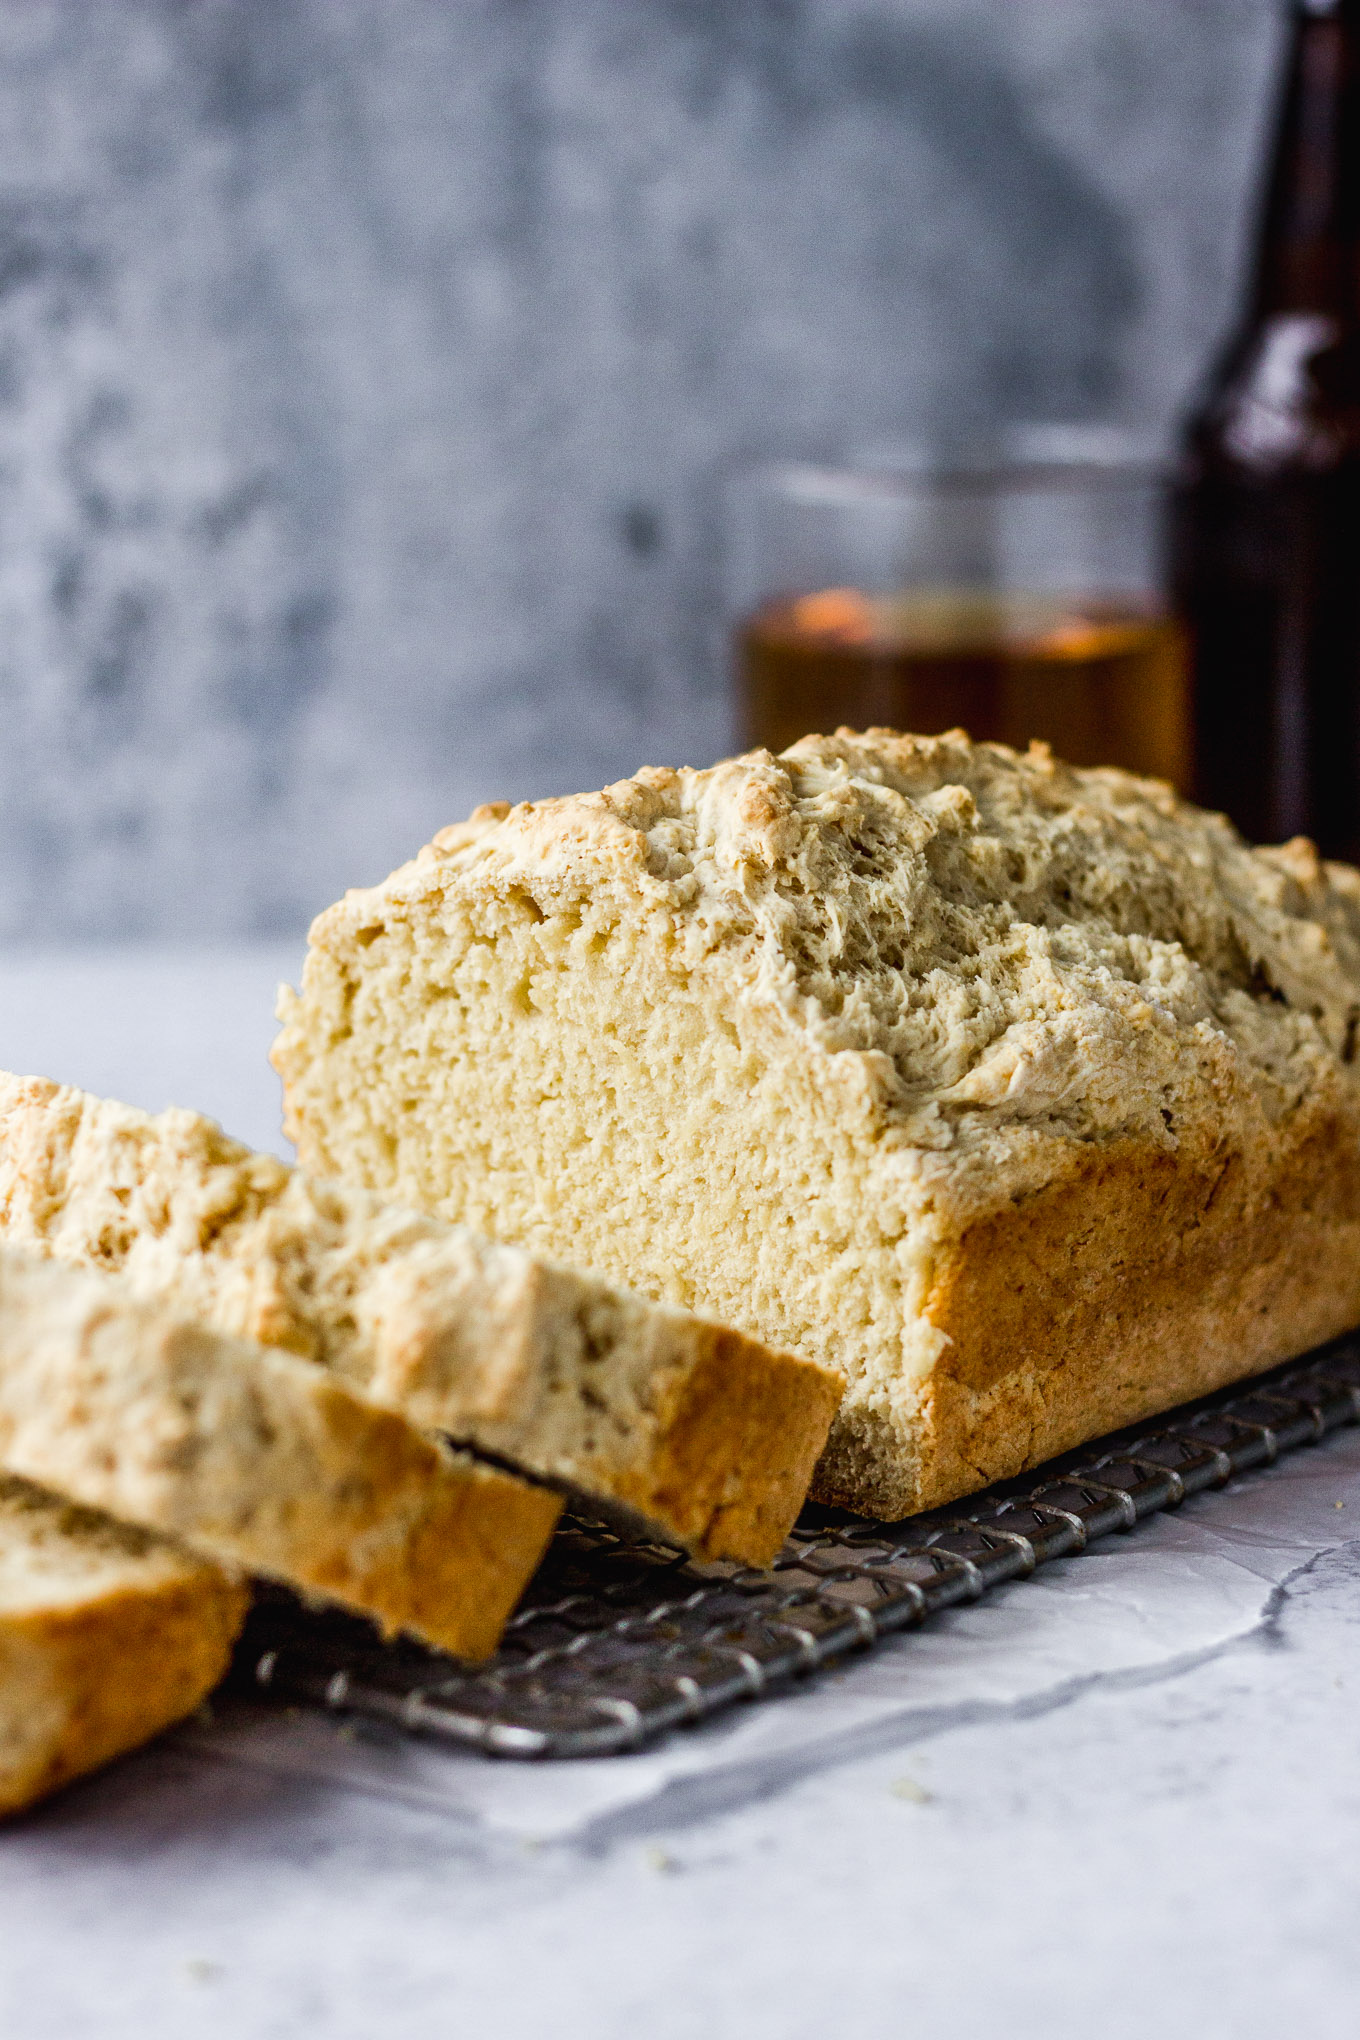 beer bread loaf sliced next to beer